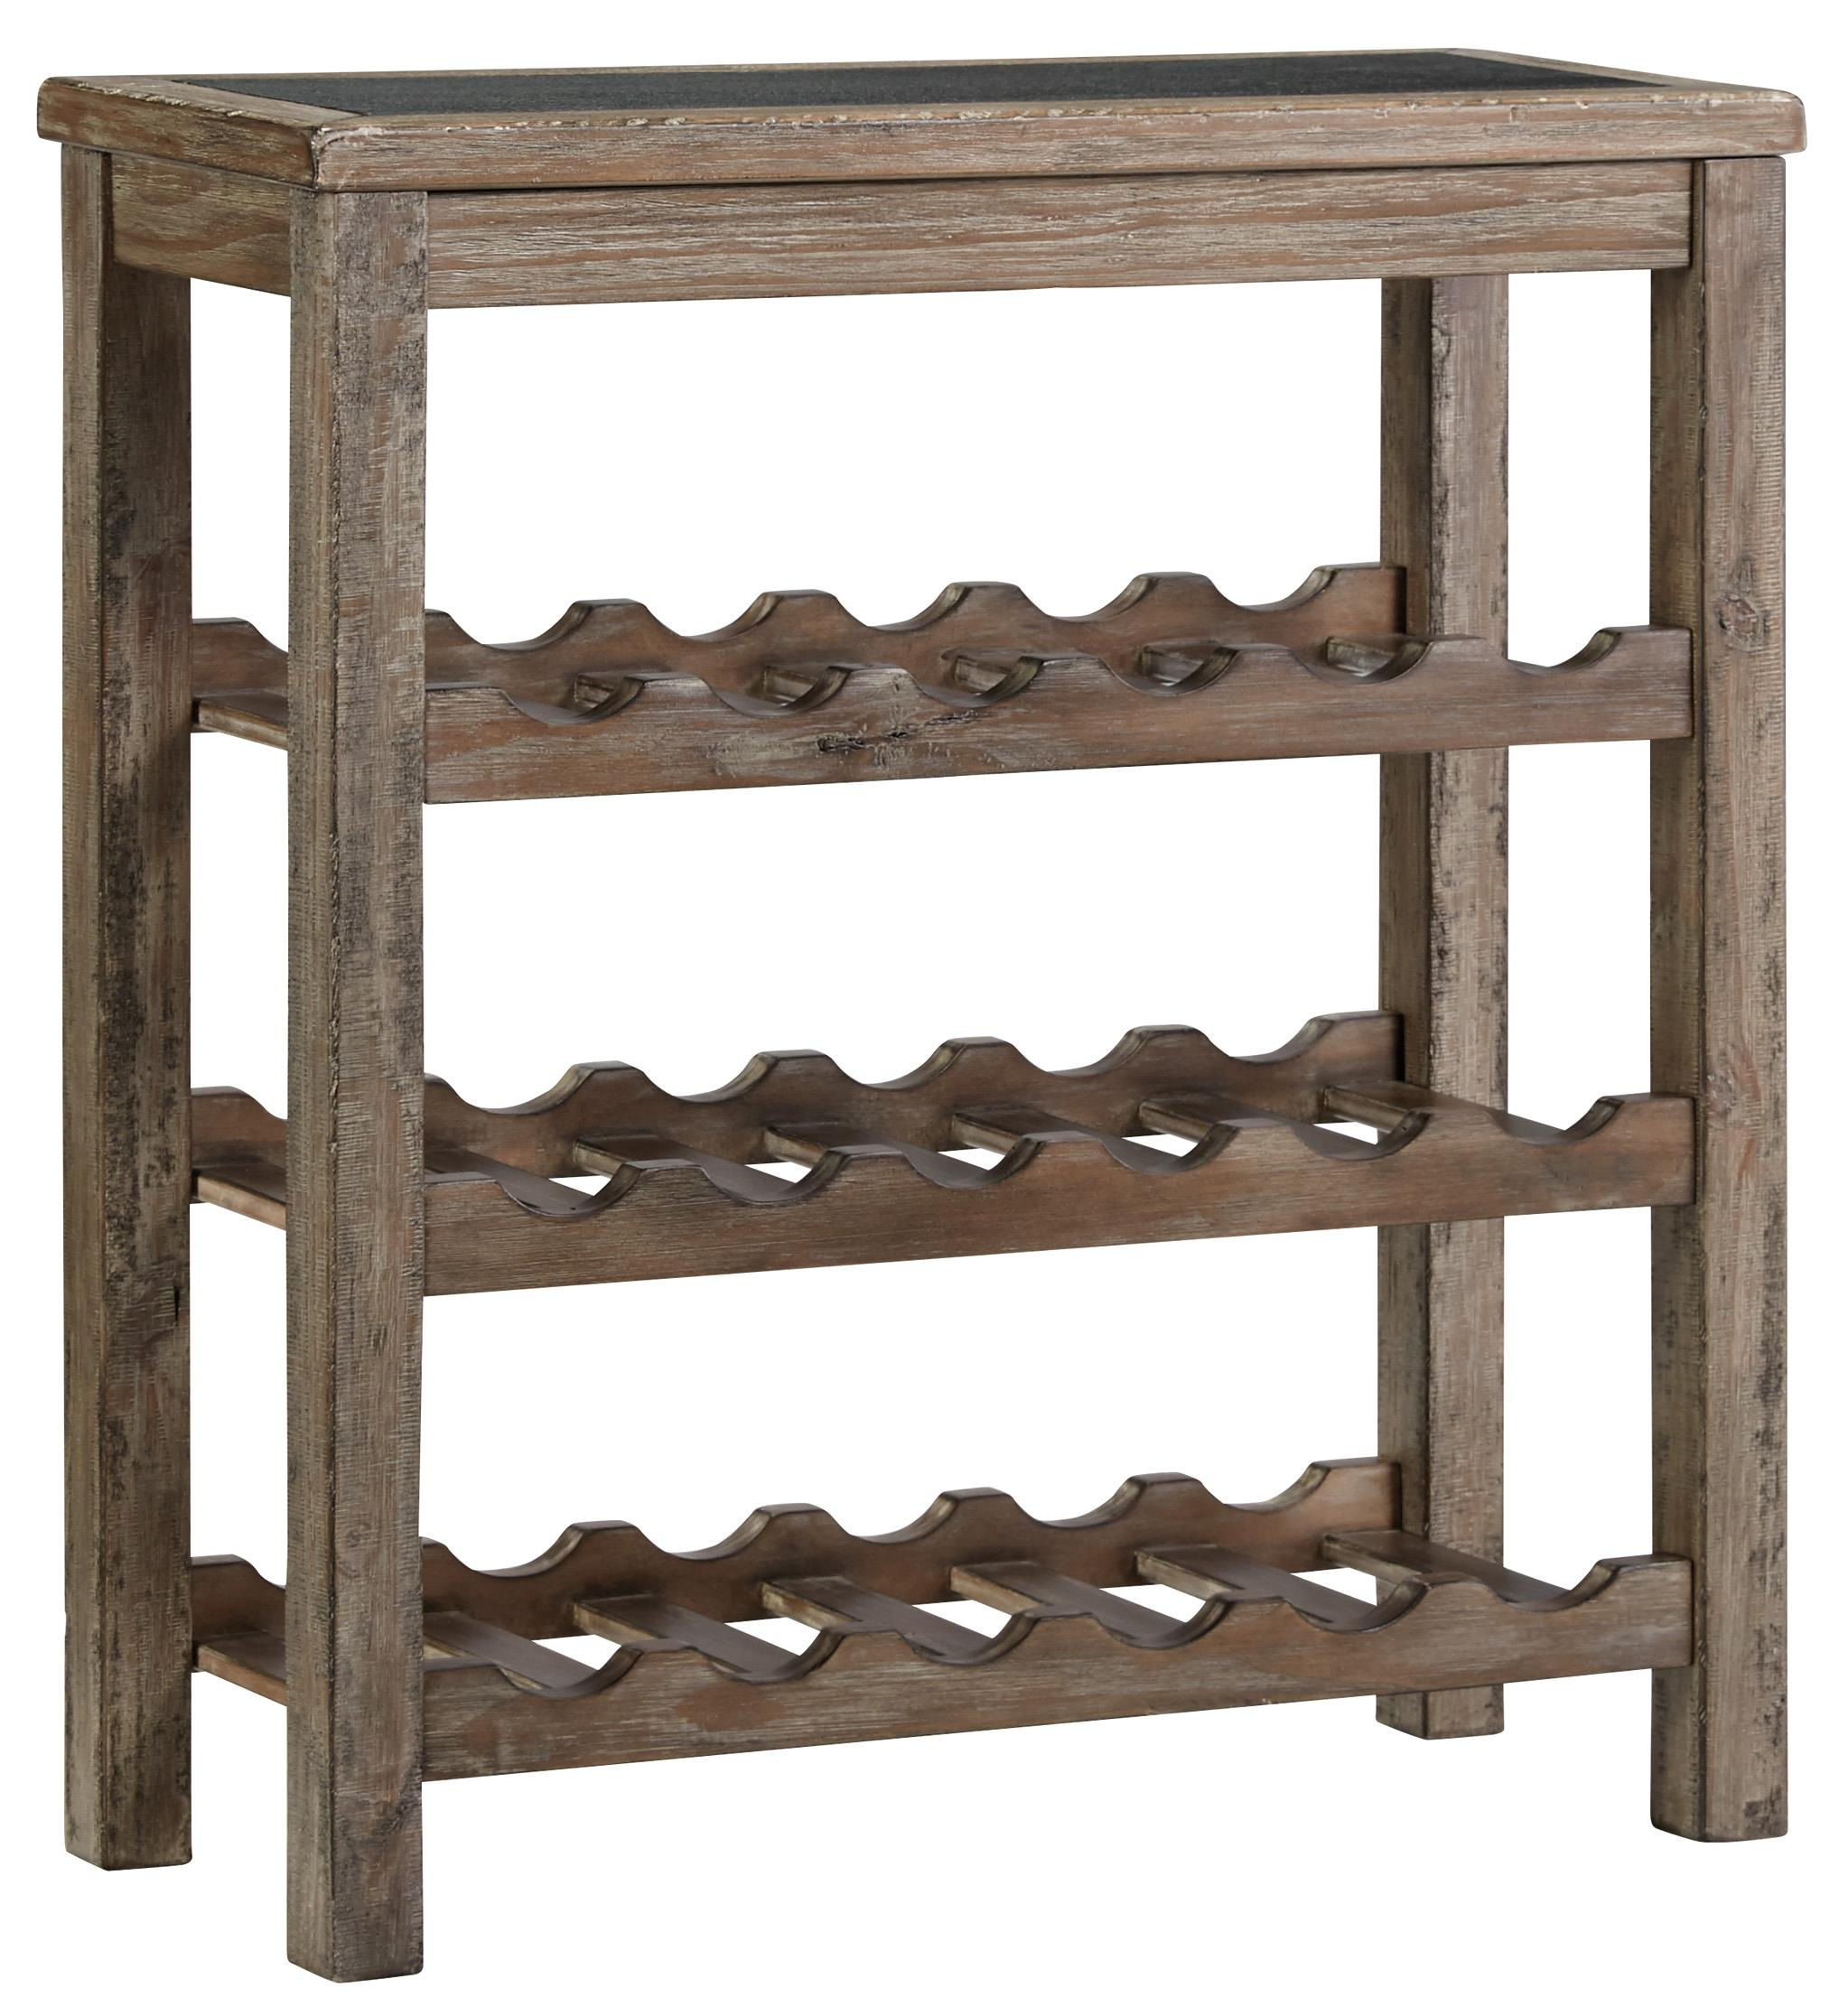 Signature Design by Ashley Furniture Vennilux Wine Rack - Item Number: T500-114